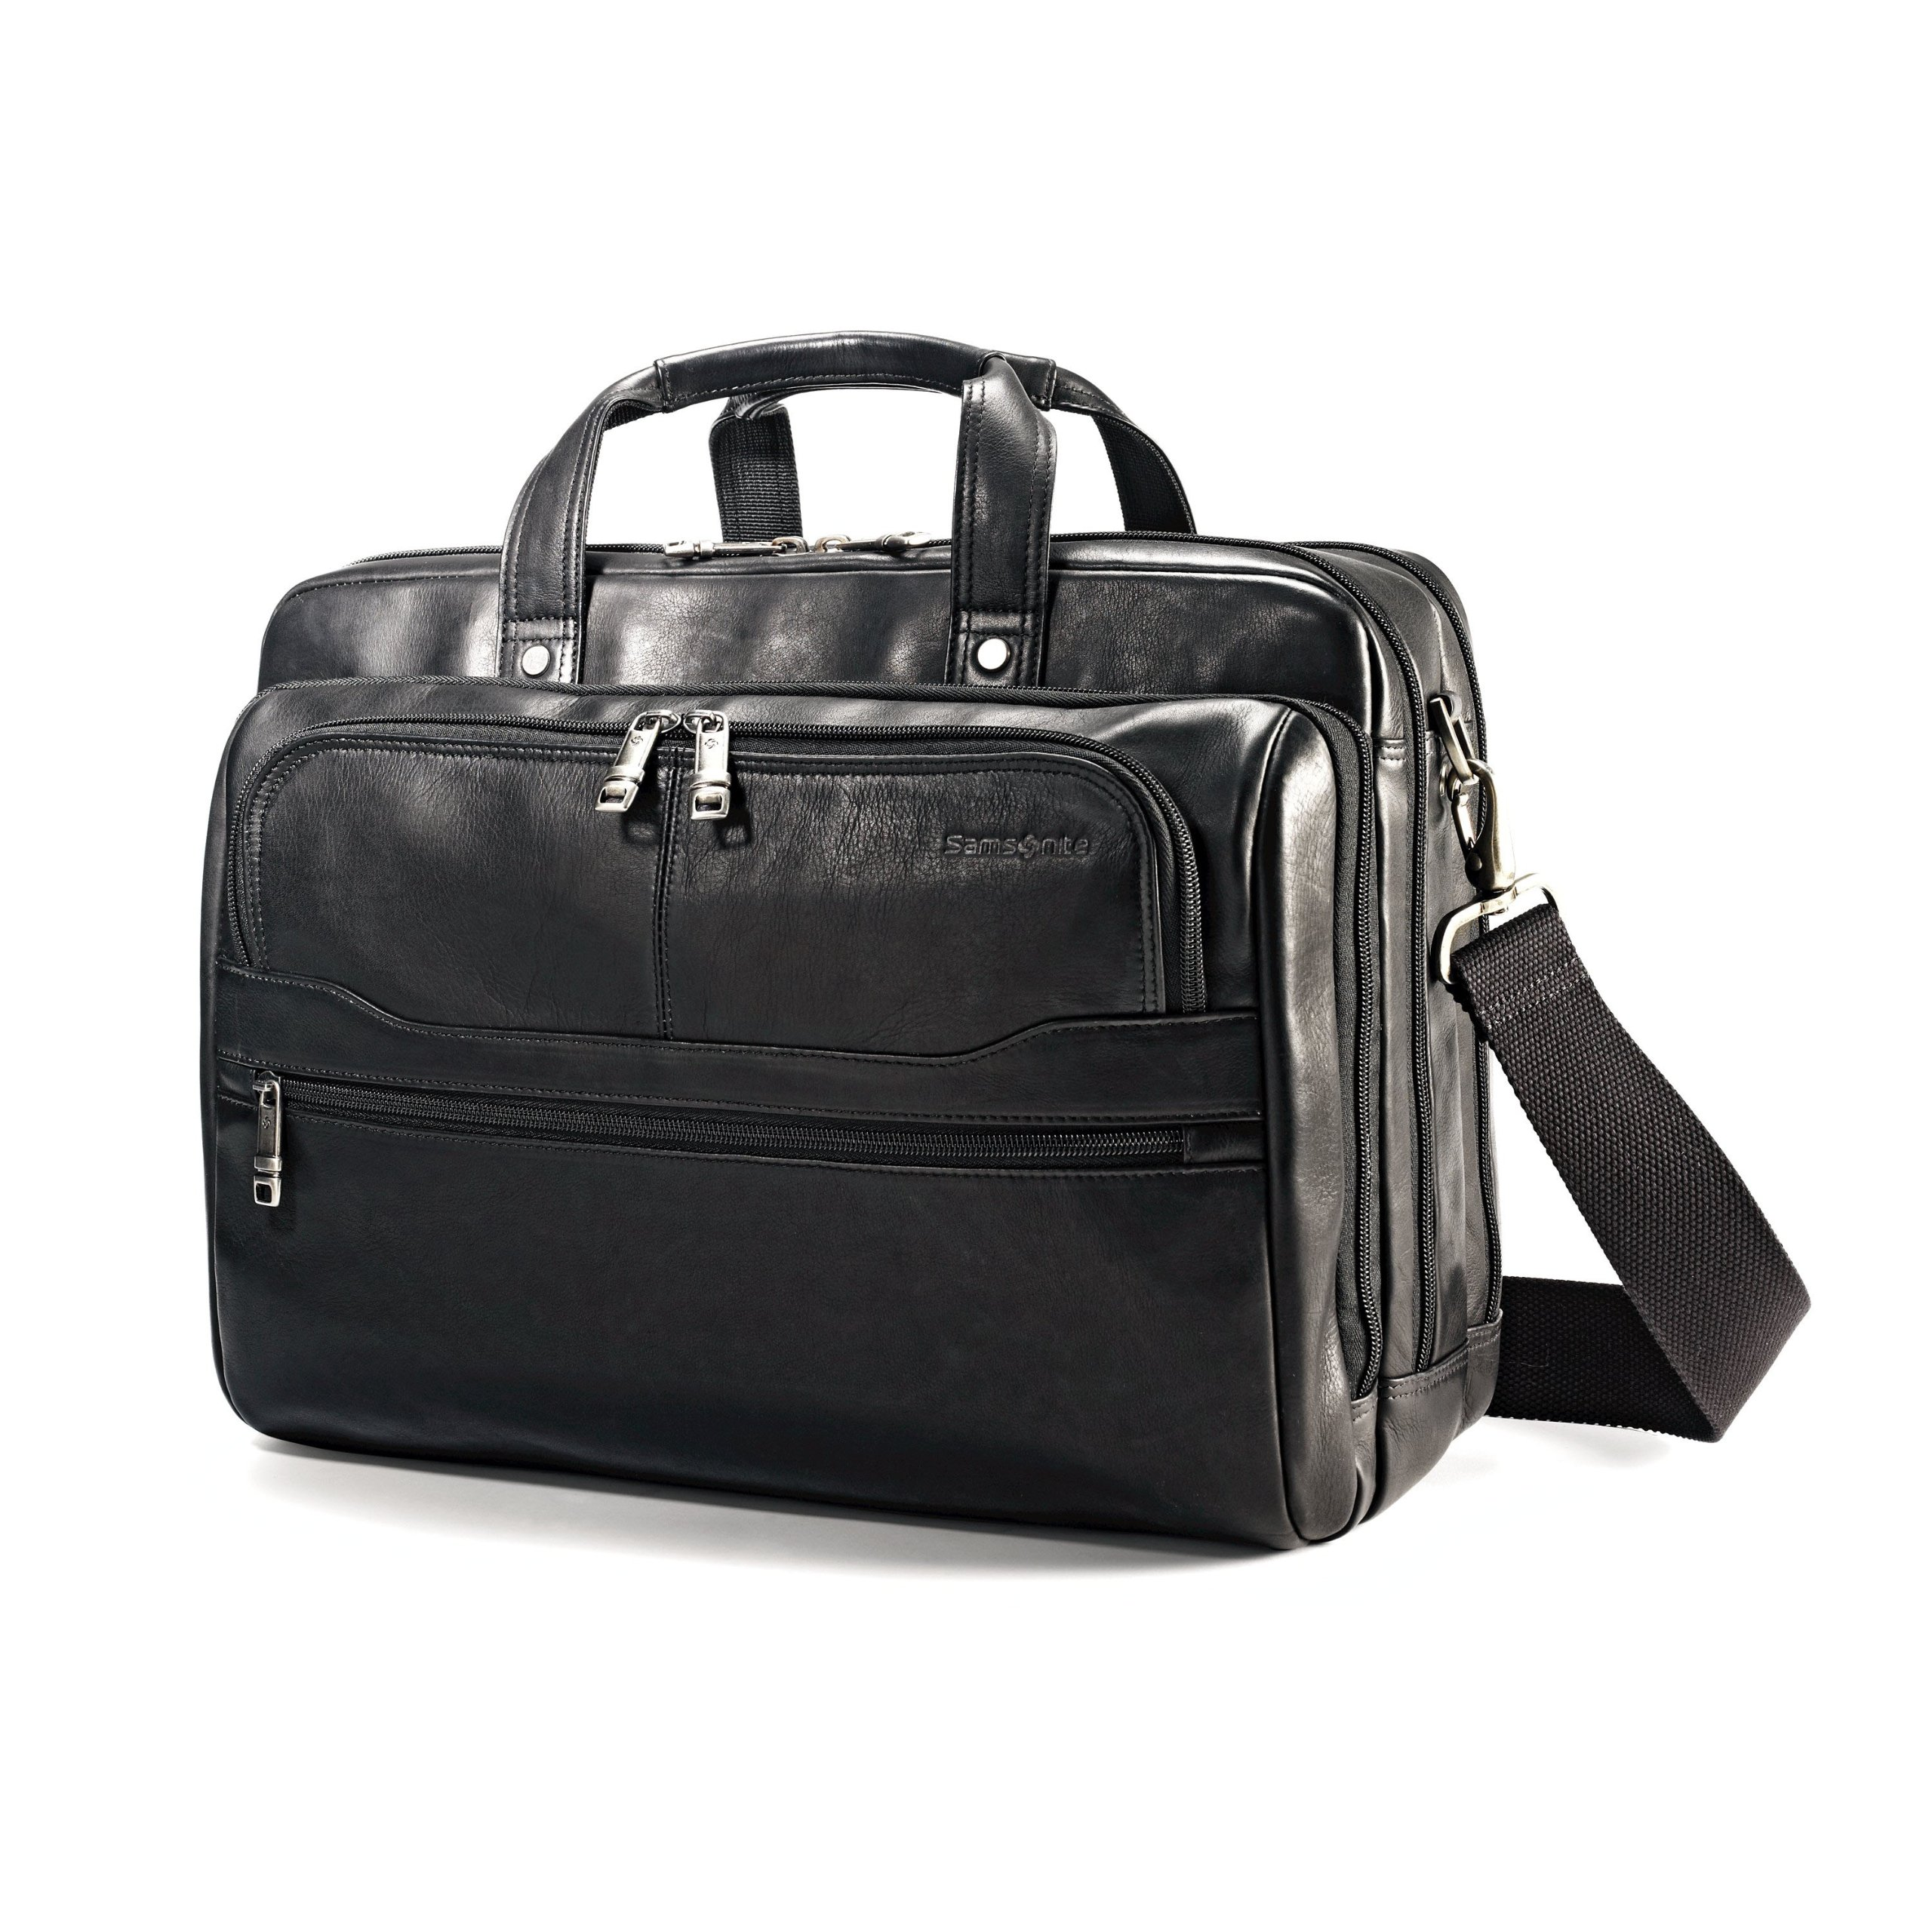 Samsonite Vachetta Leather 2 Pocket Business Case Black